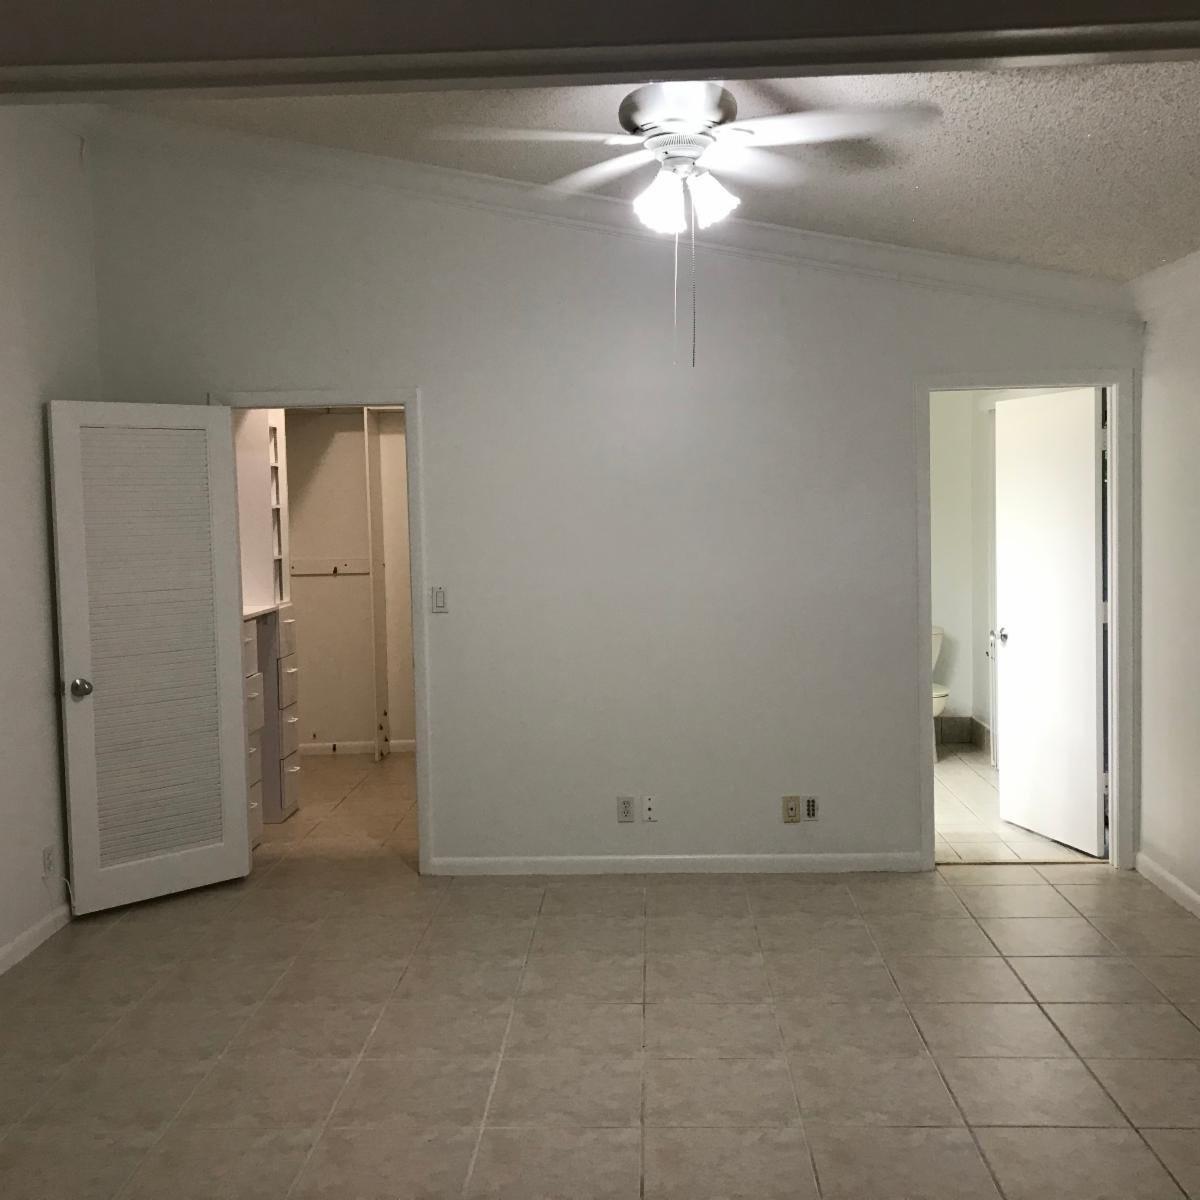 22578 Vistawood Way Boca Raton, FL 33428, USA